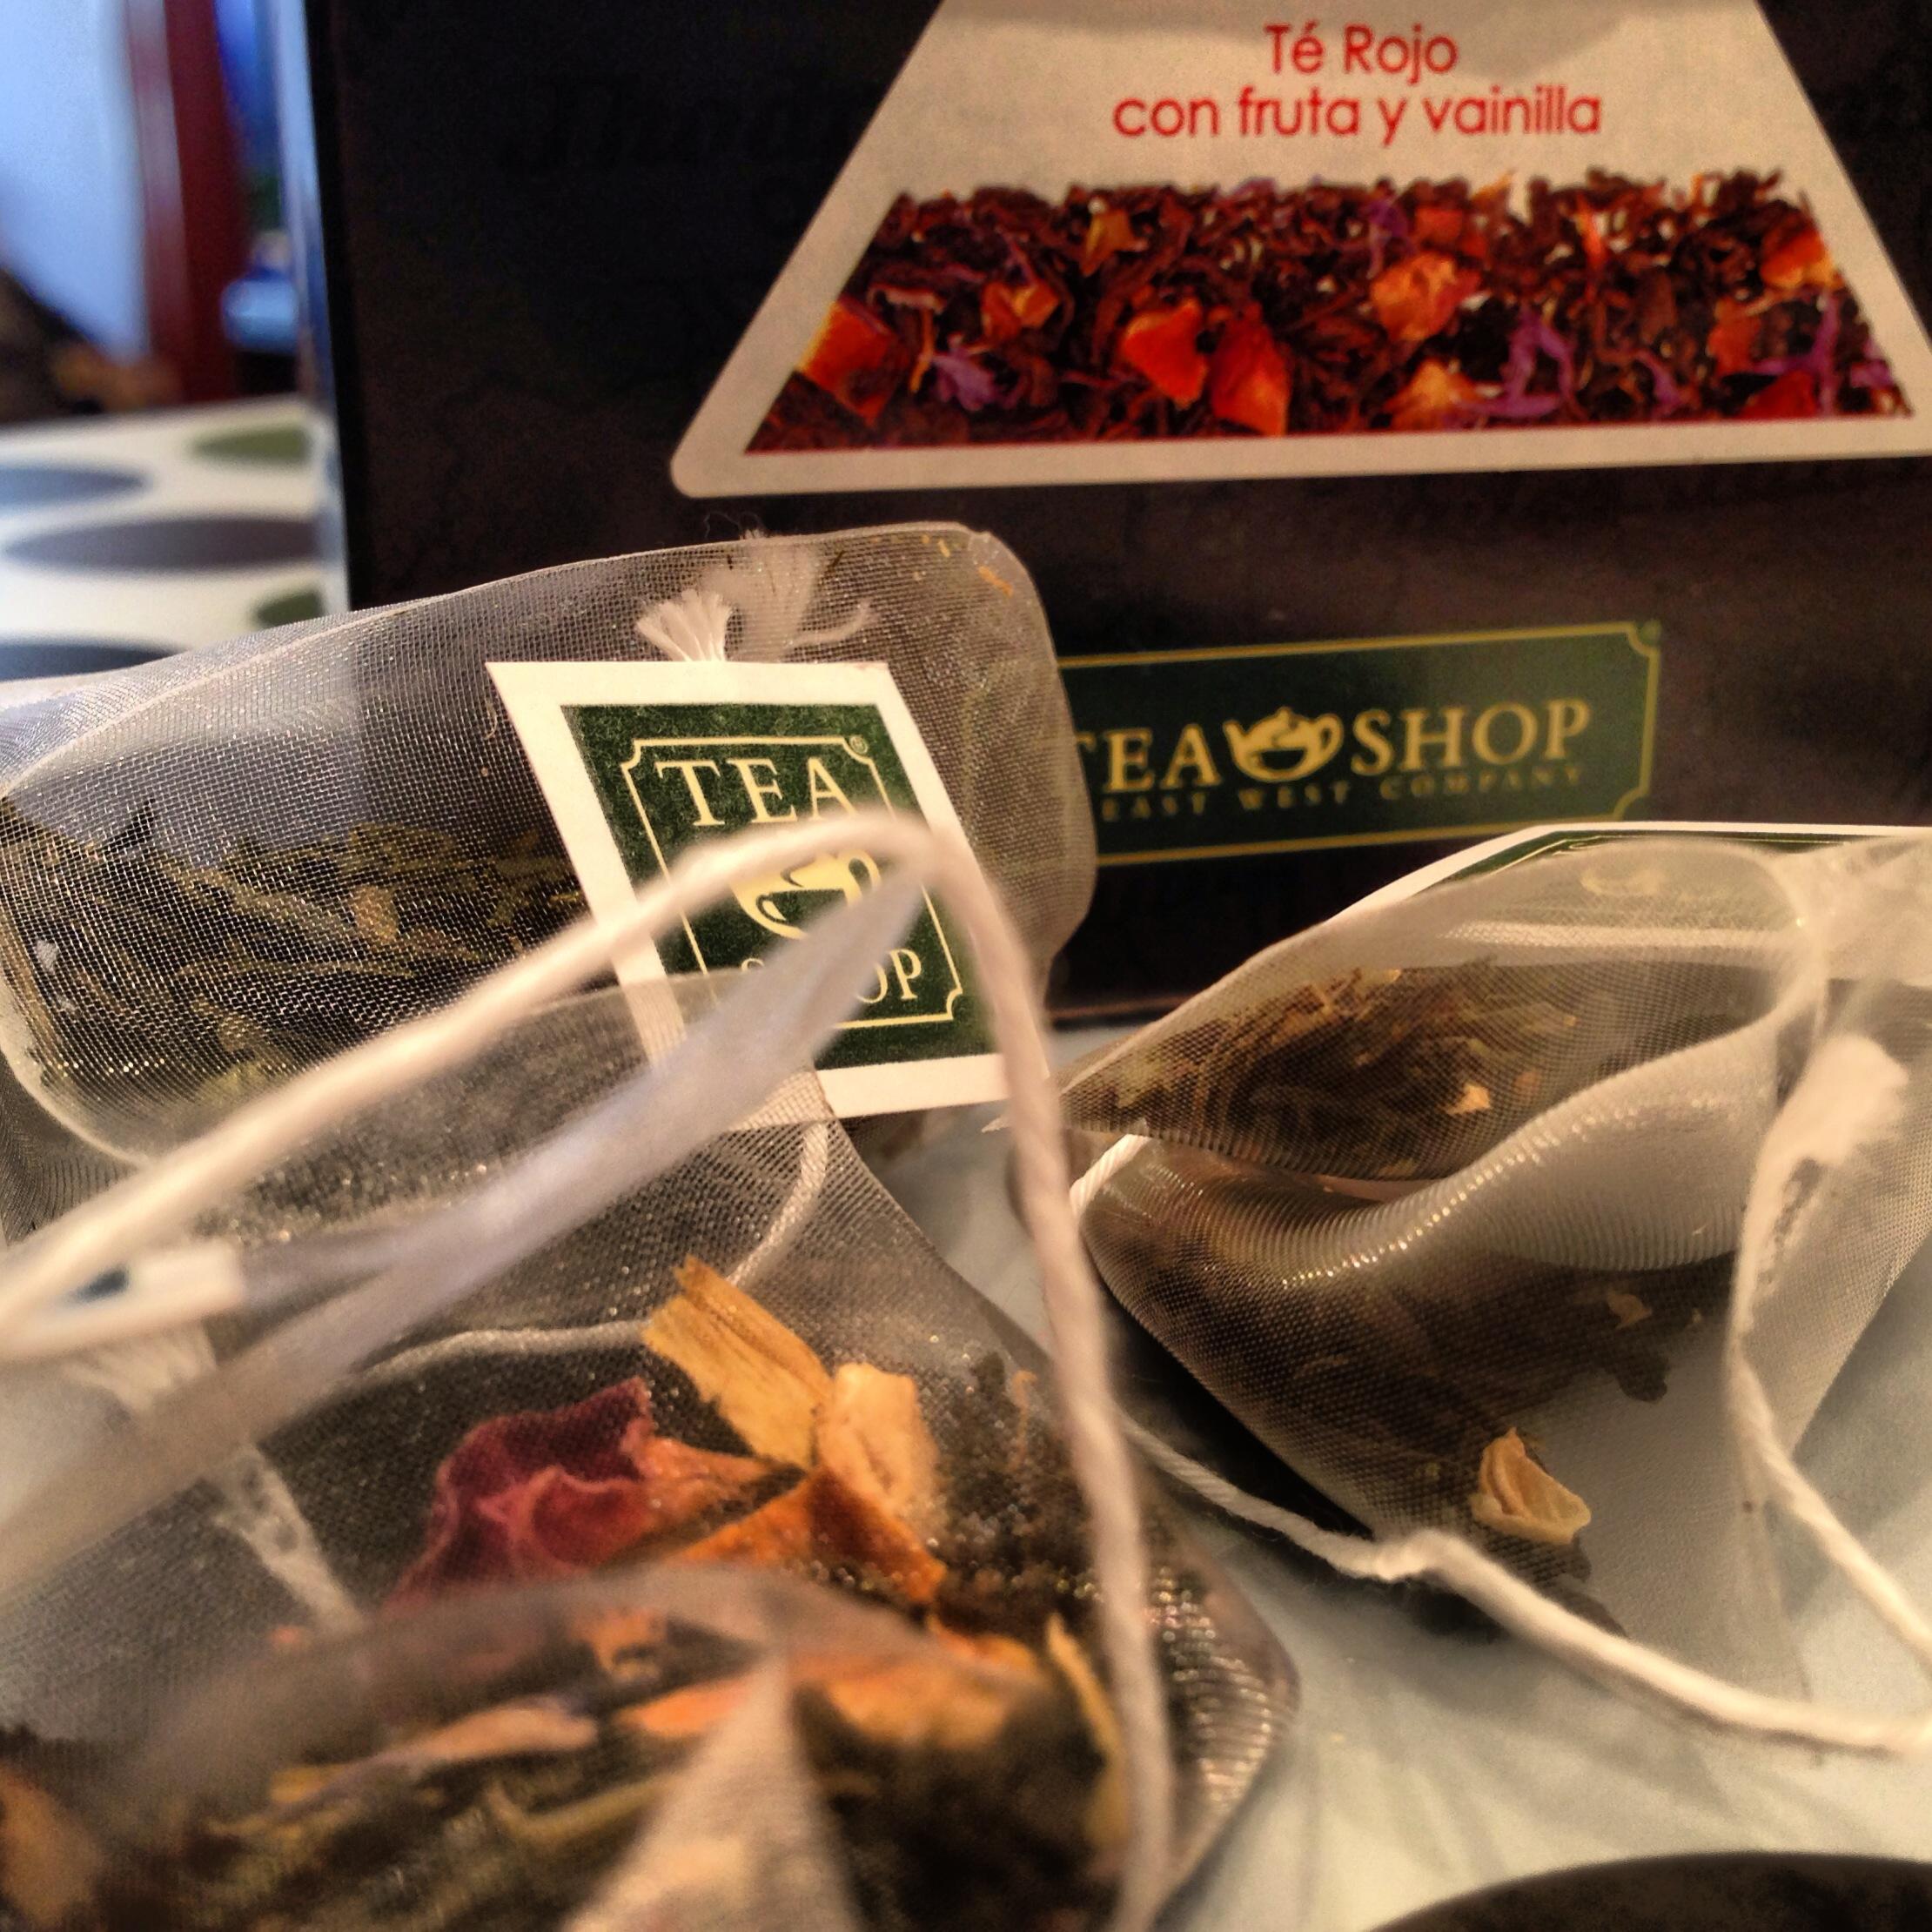 Tea shop a ugramadan barcelona dan donmek olmazneredeyesek neredeyesek - Tea shop barcelona ...